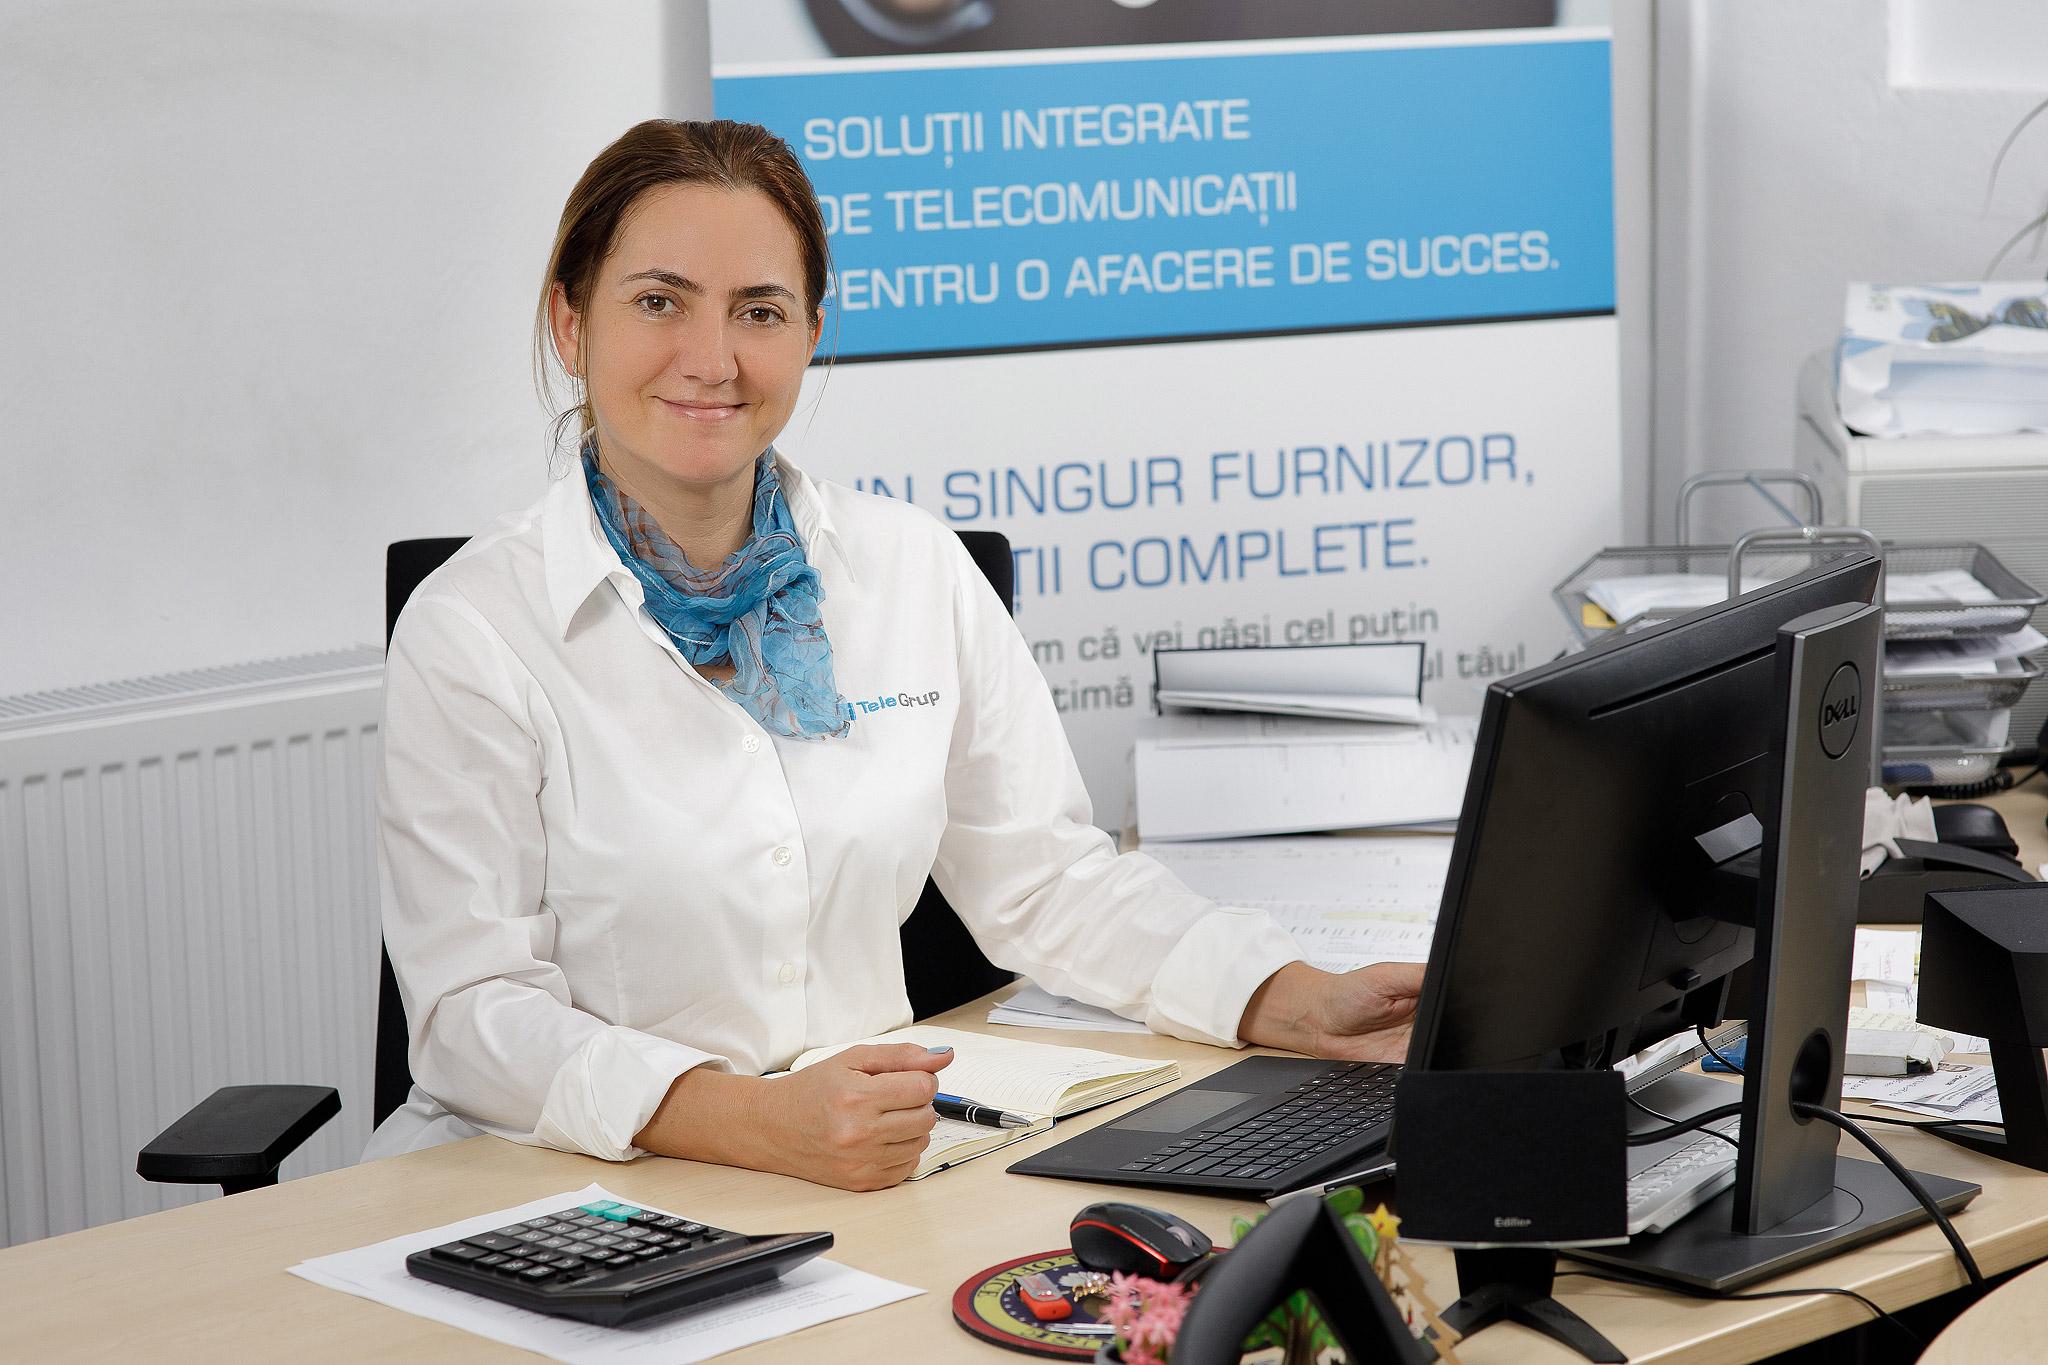 Nicoleta Moise